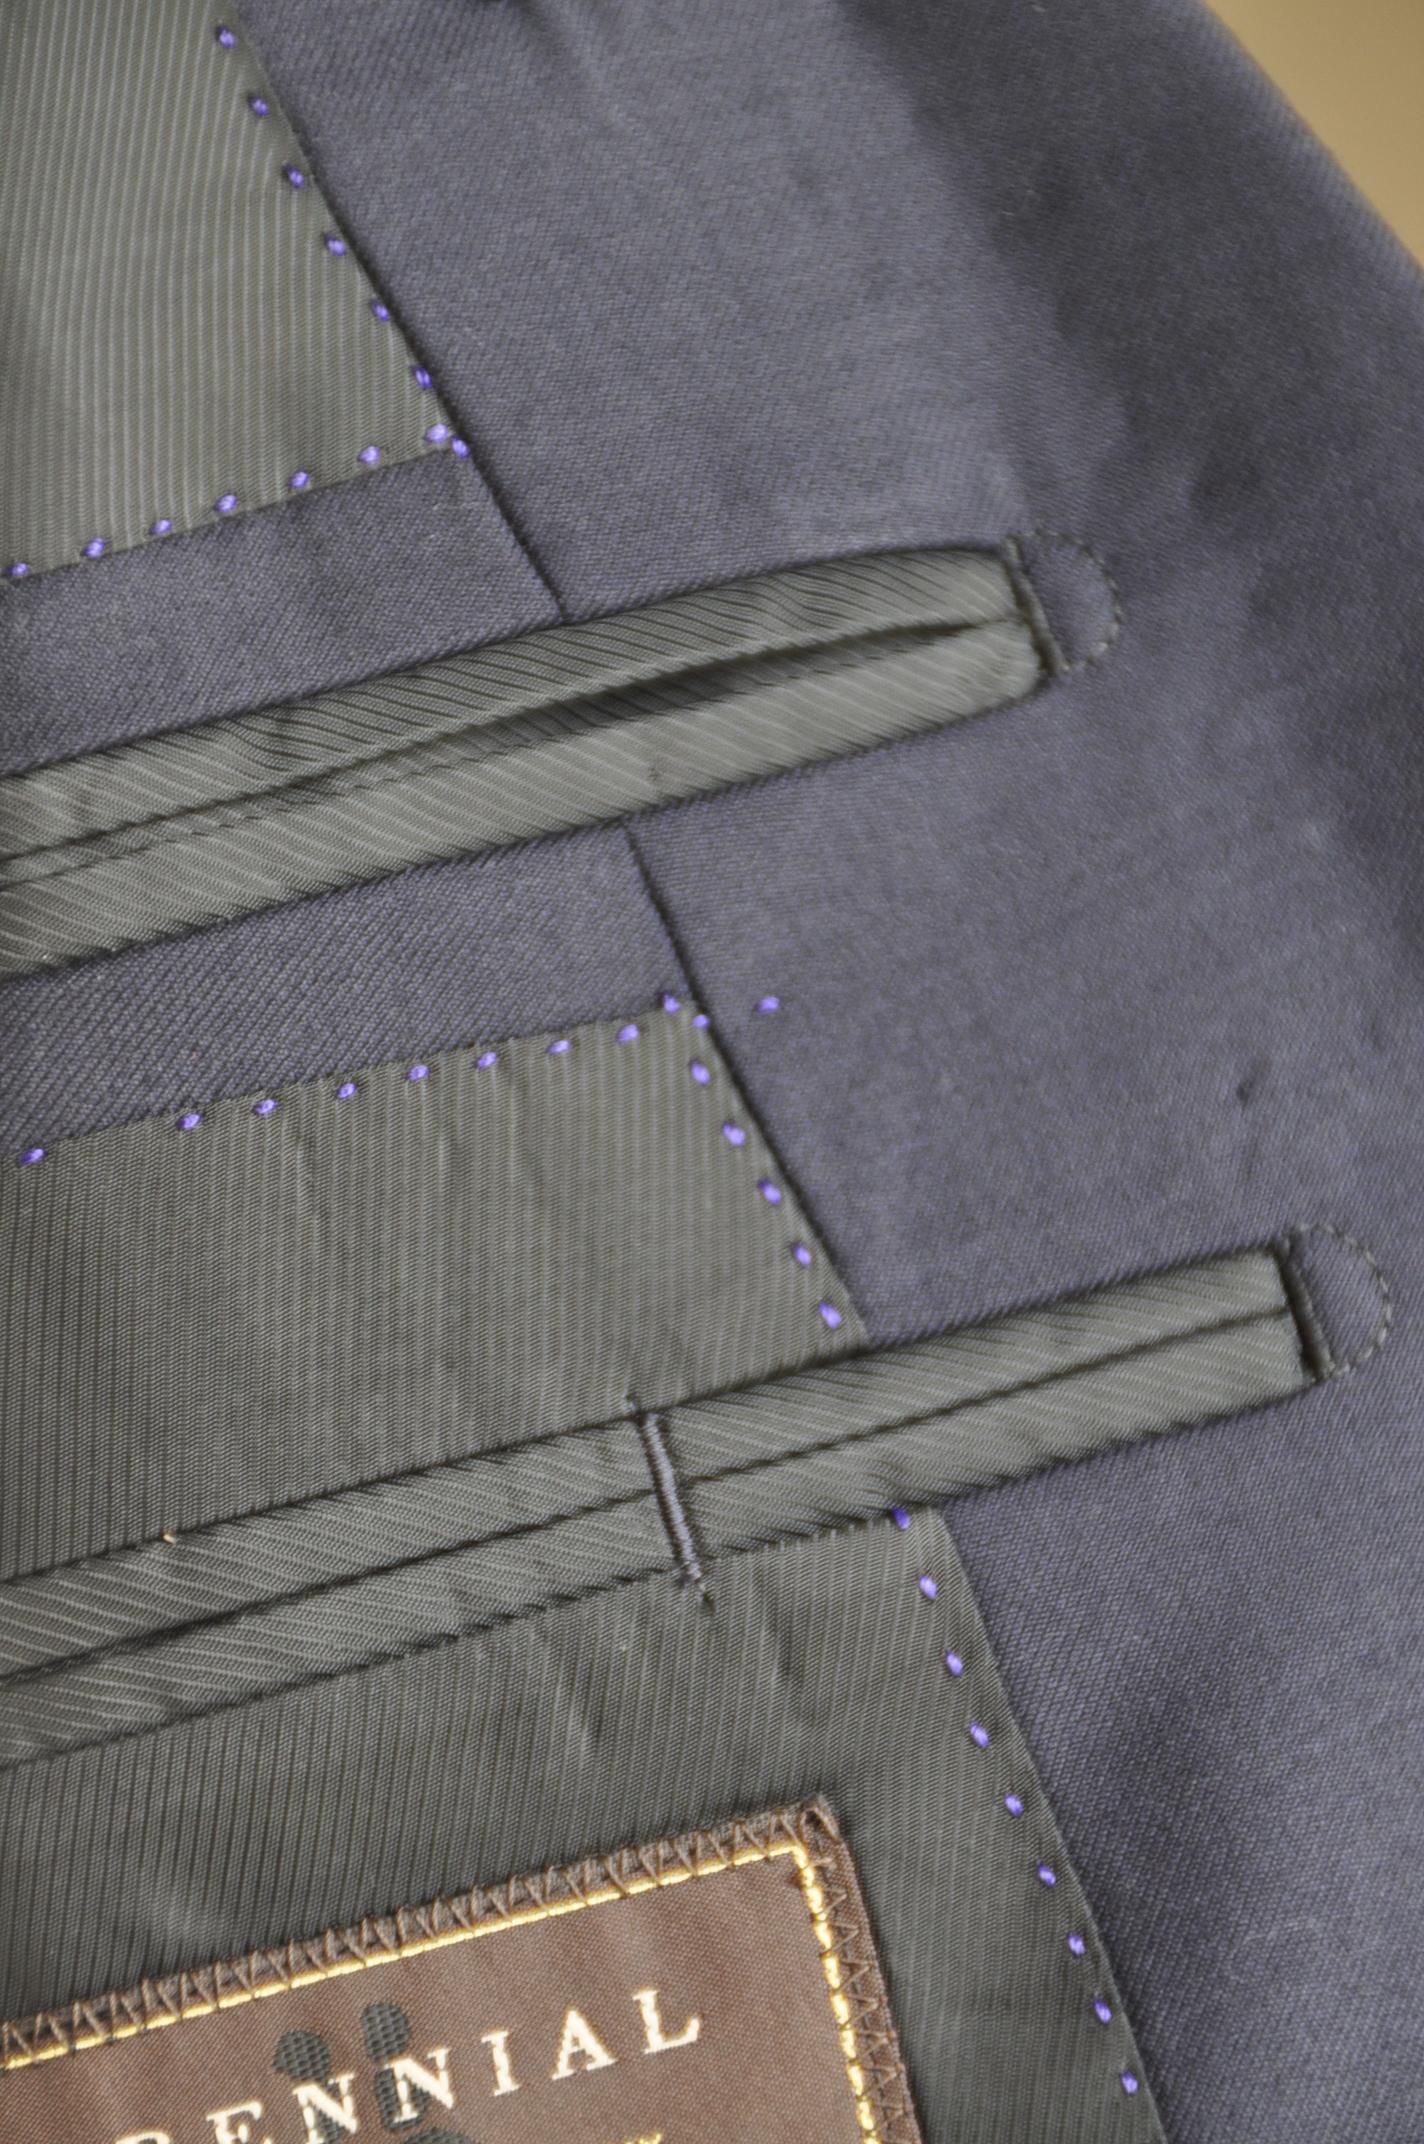 DSC00681 オーダースーツ- CANONICO ソリッドネイビースーツ-